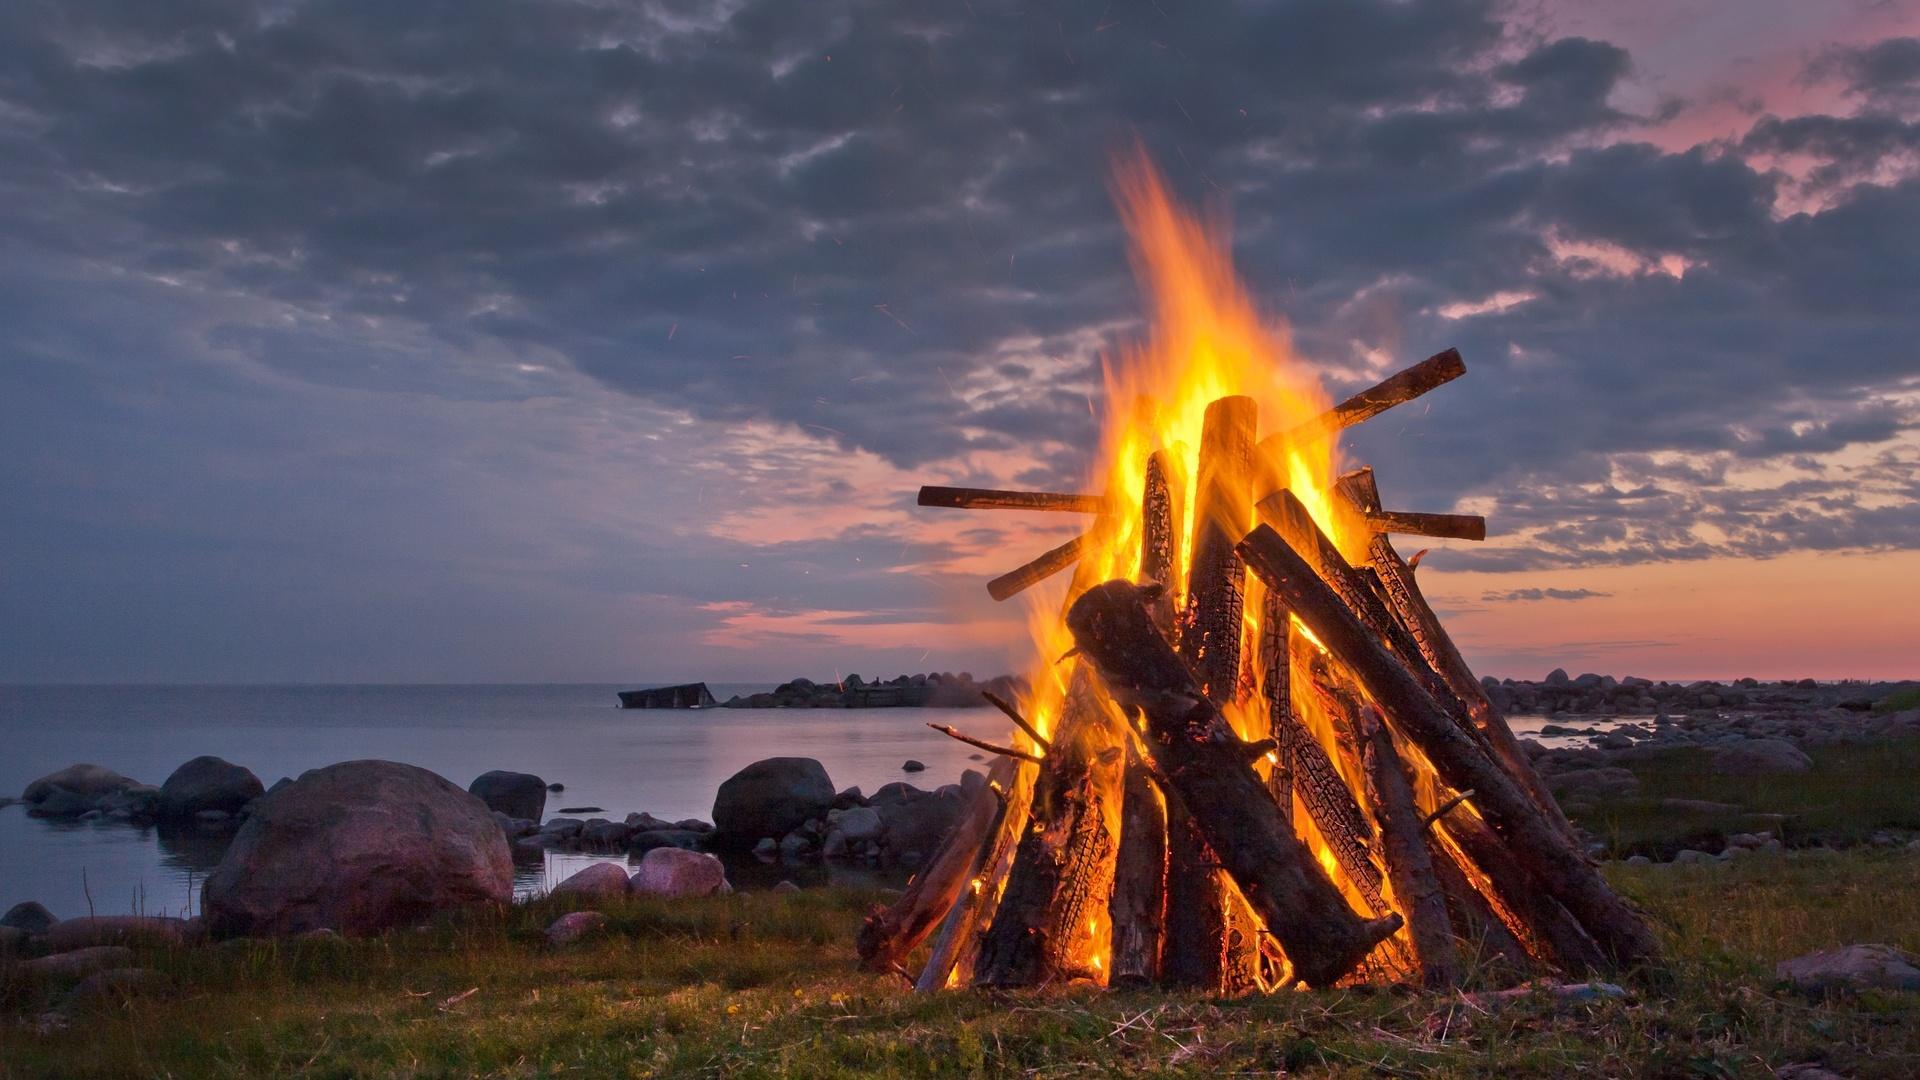 Bonfire Background